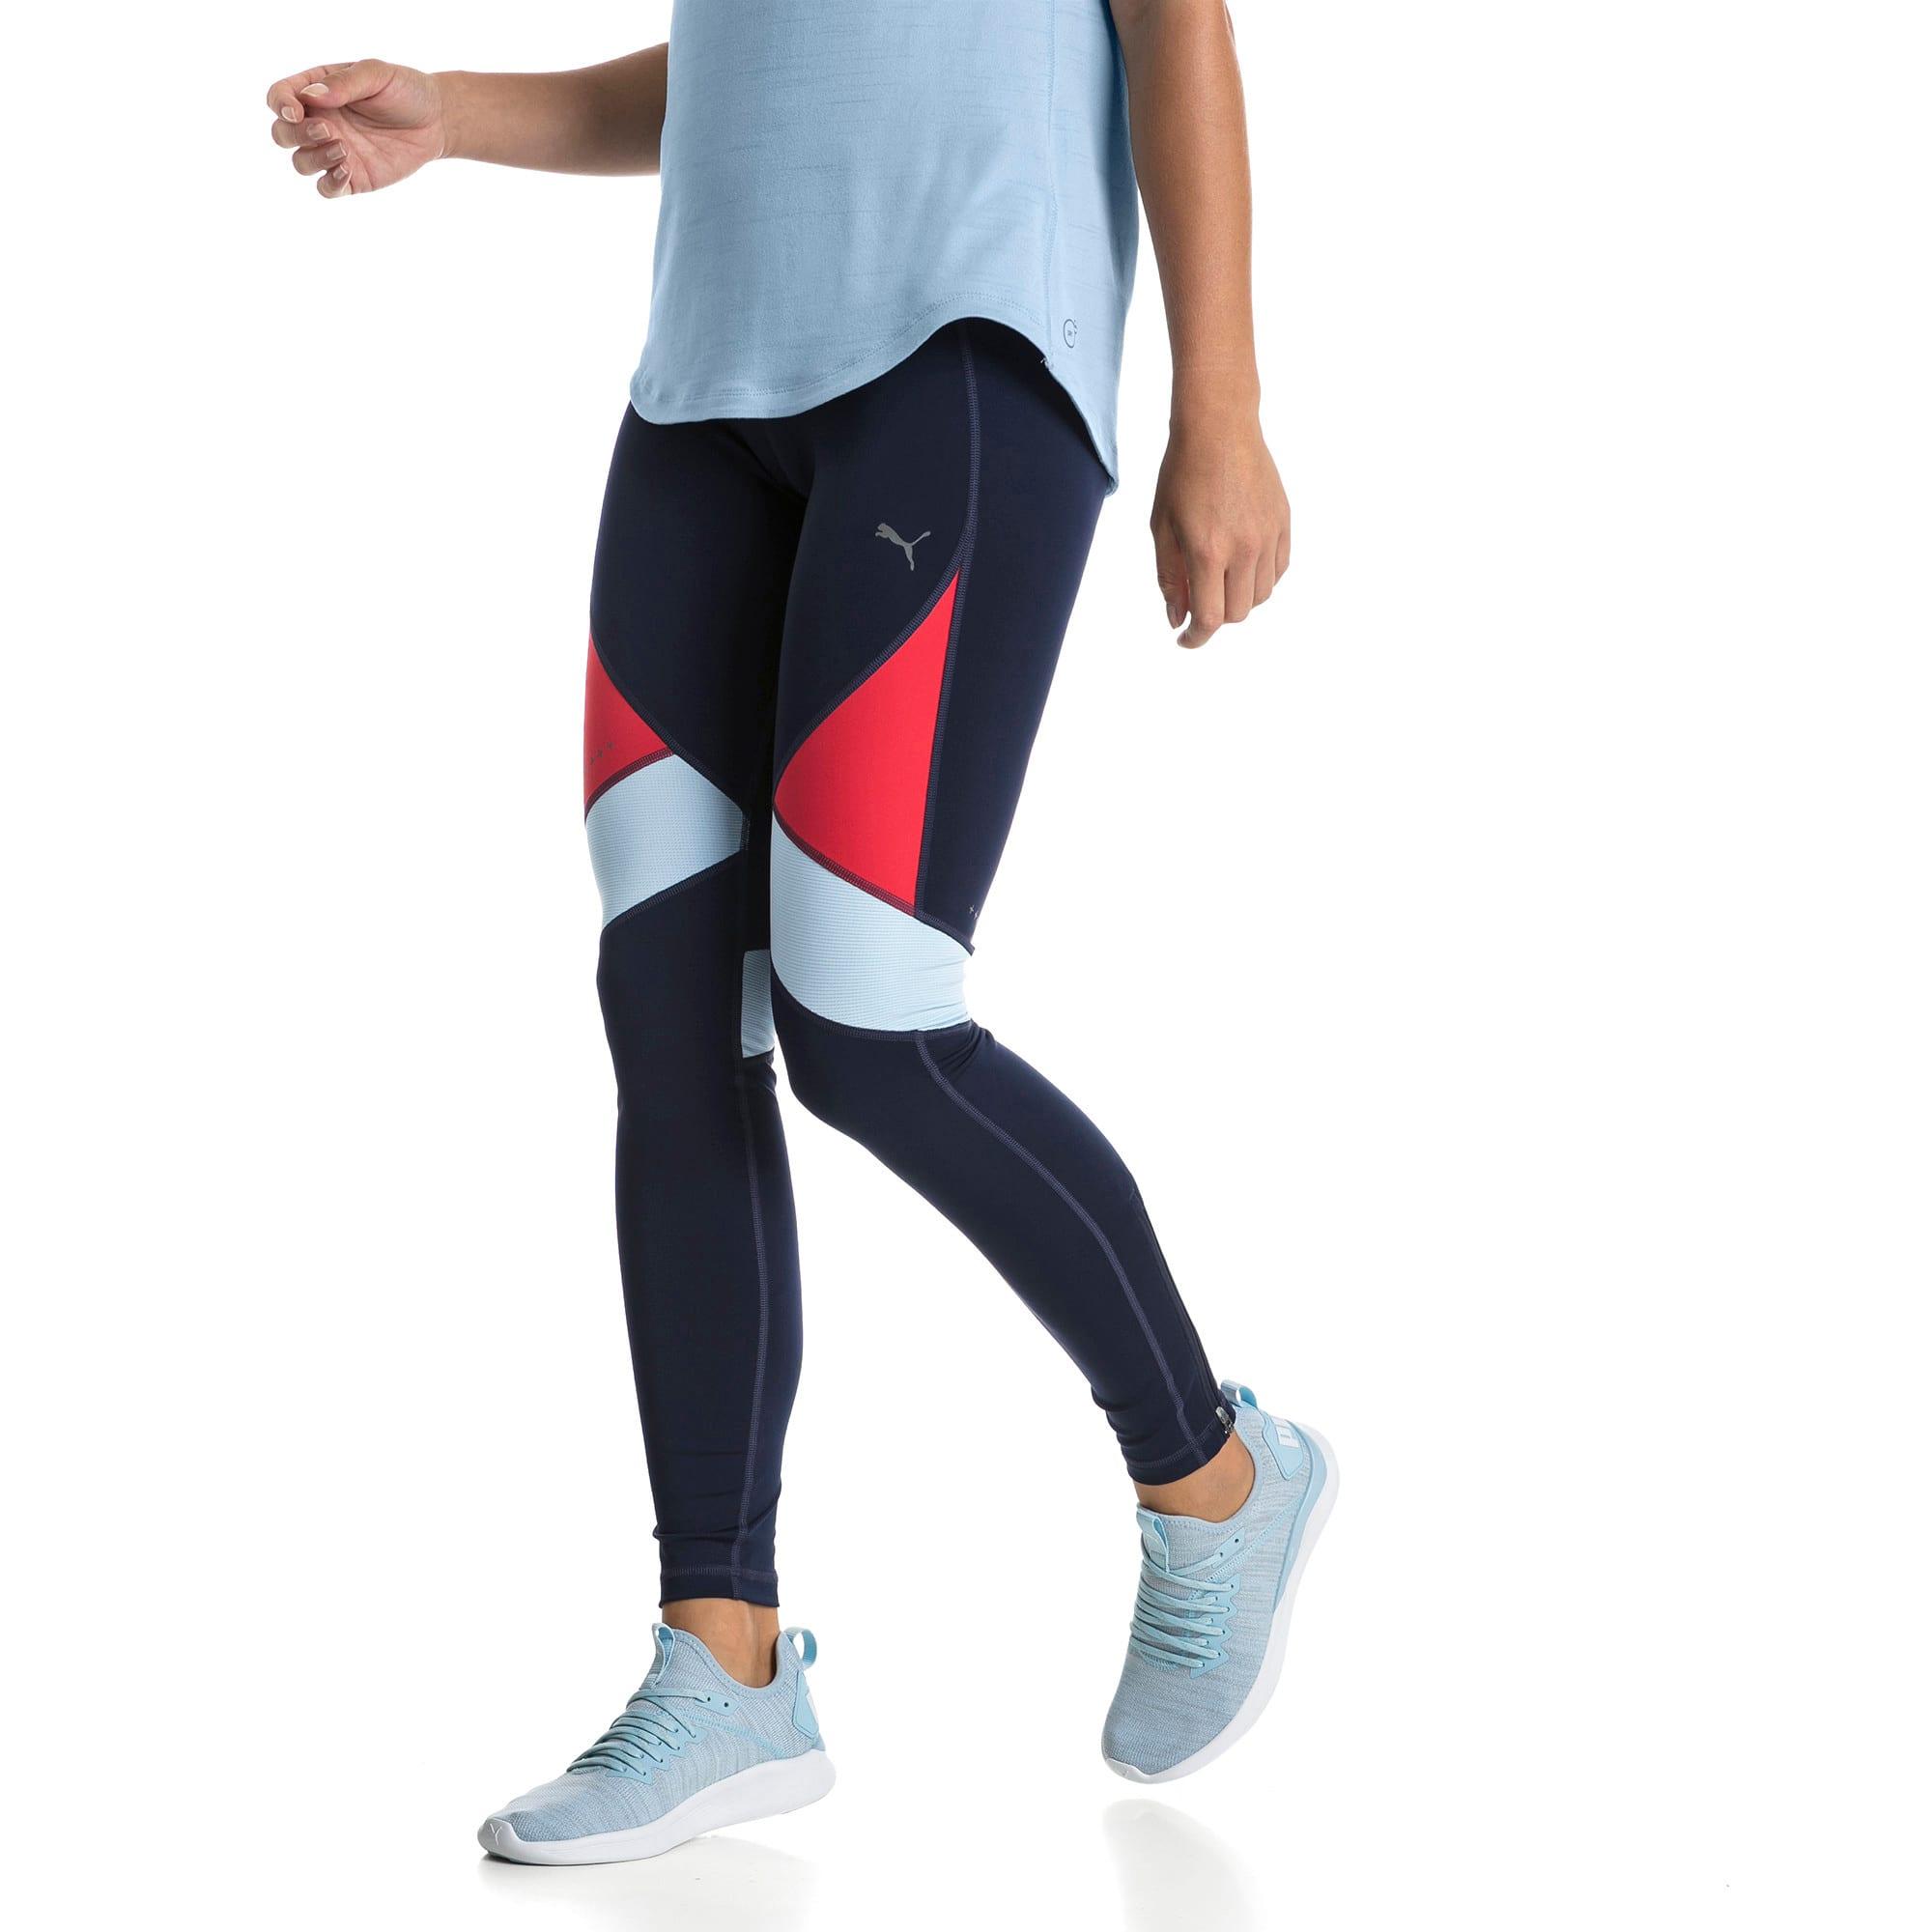 Pantaloni aderenti Running IGNITE donna